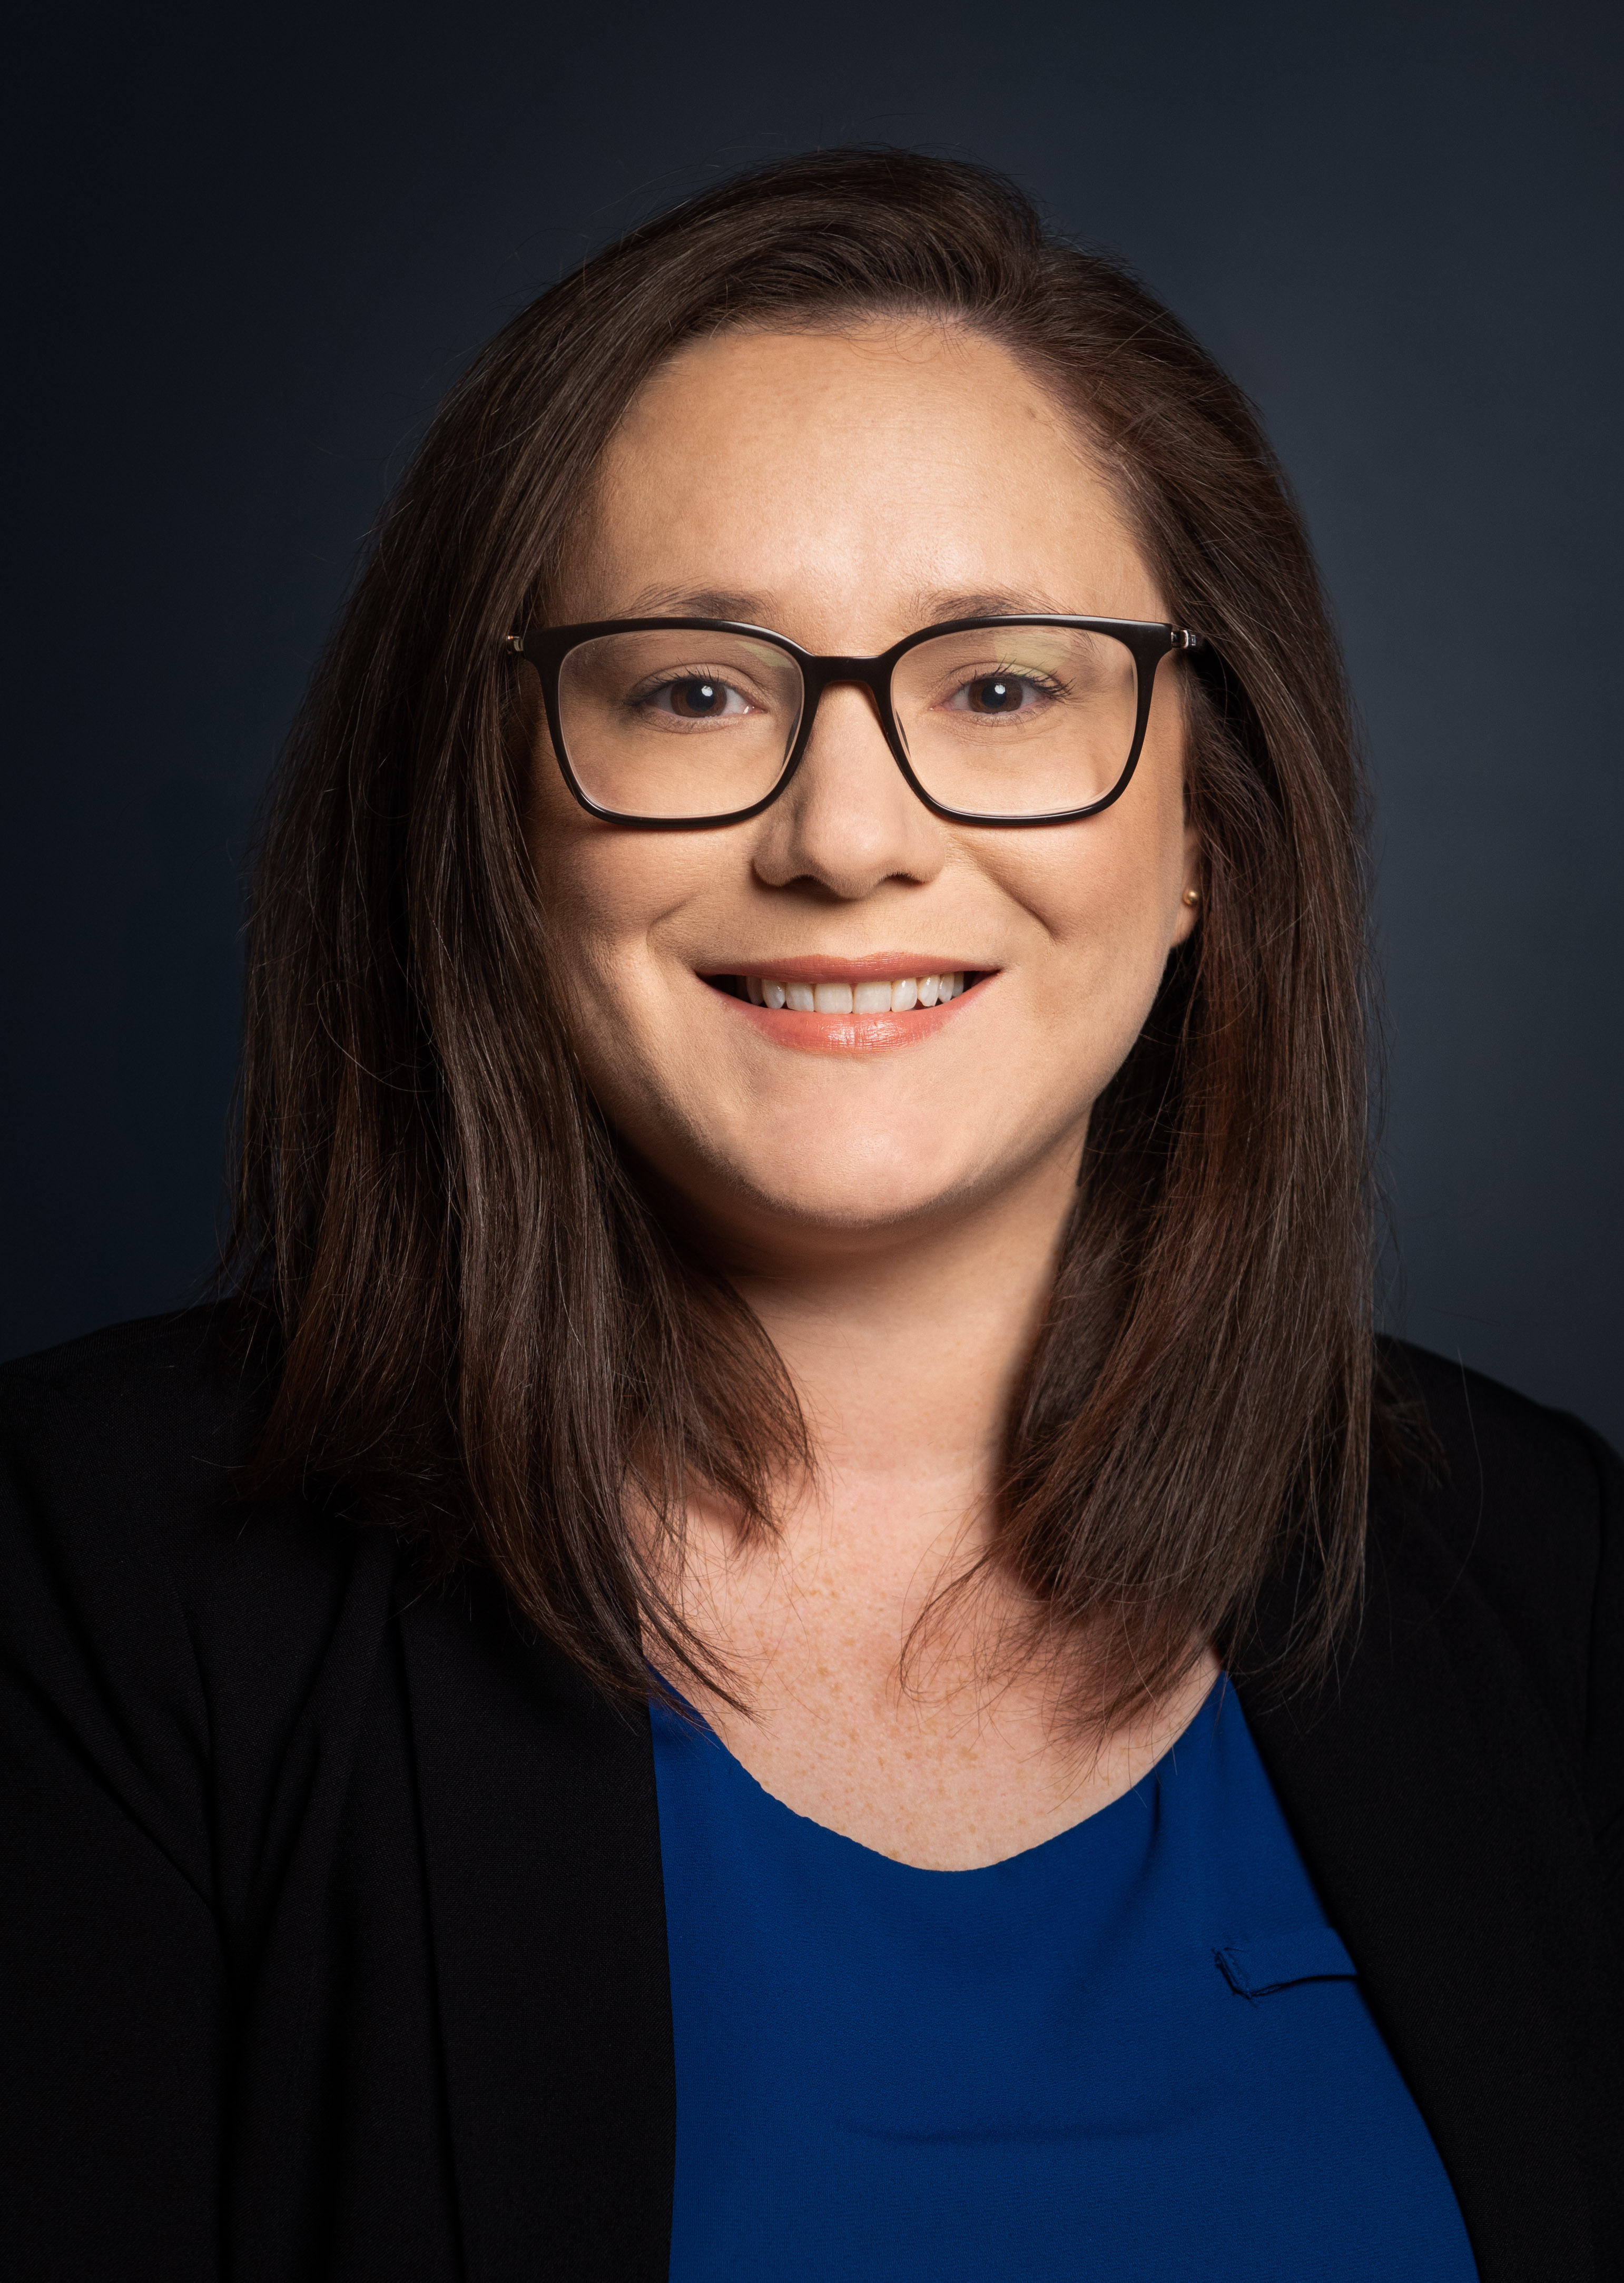 Madison Mizzau